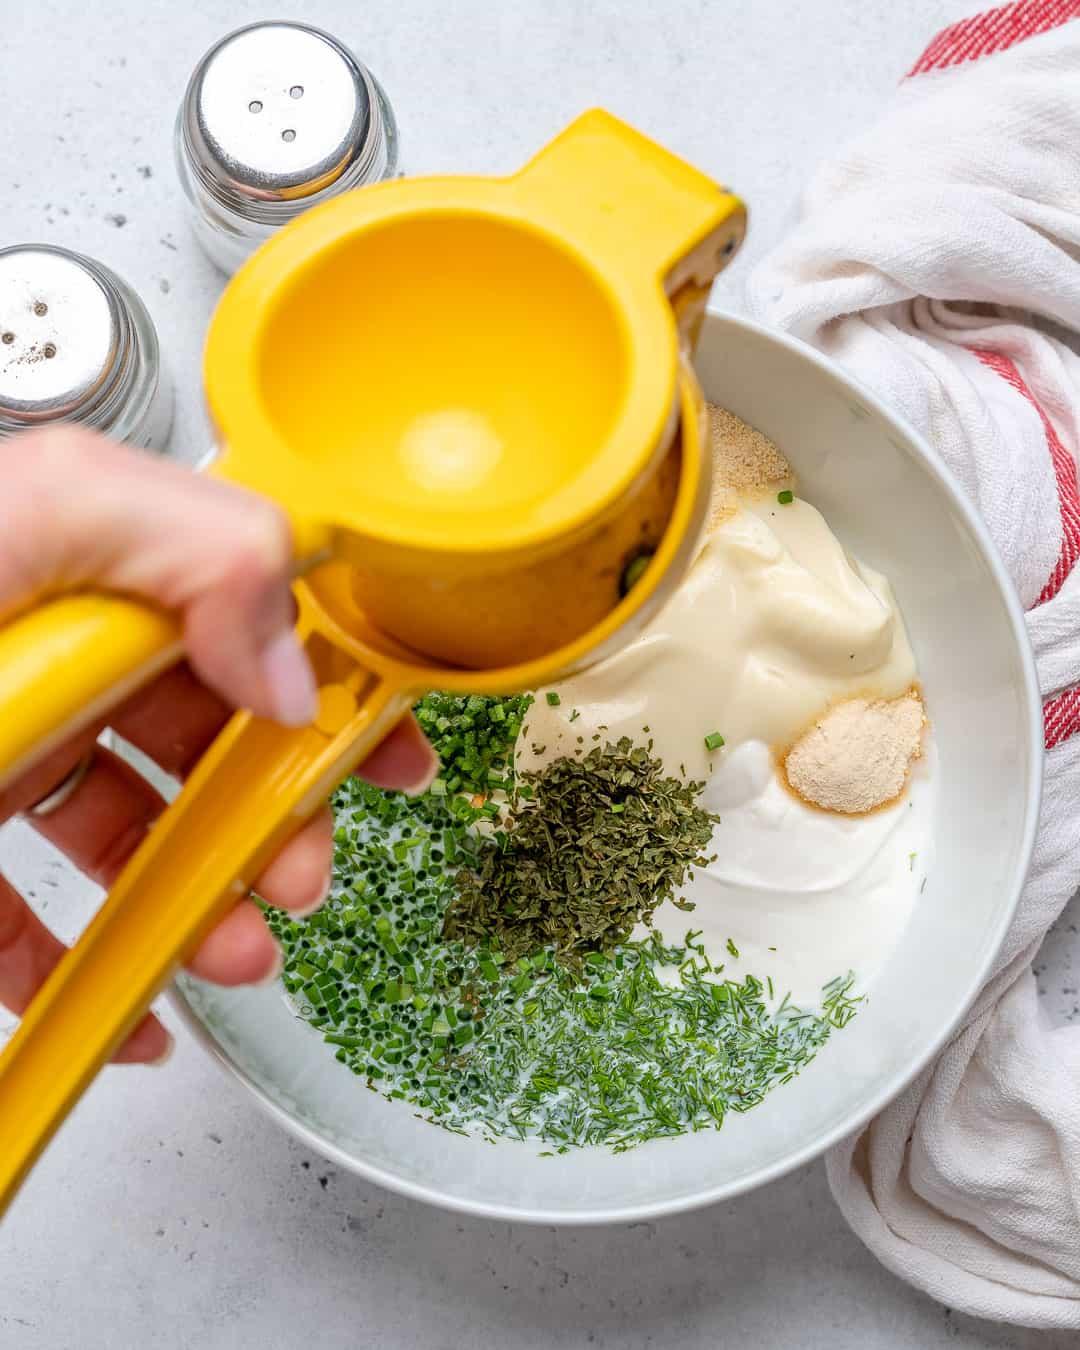 Add lemon juice to bowl.